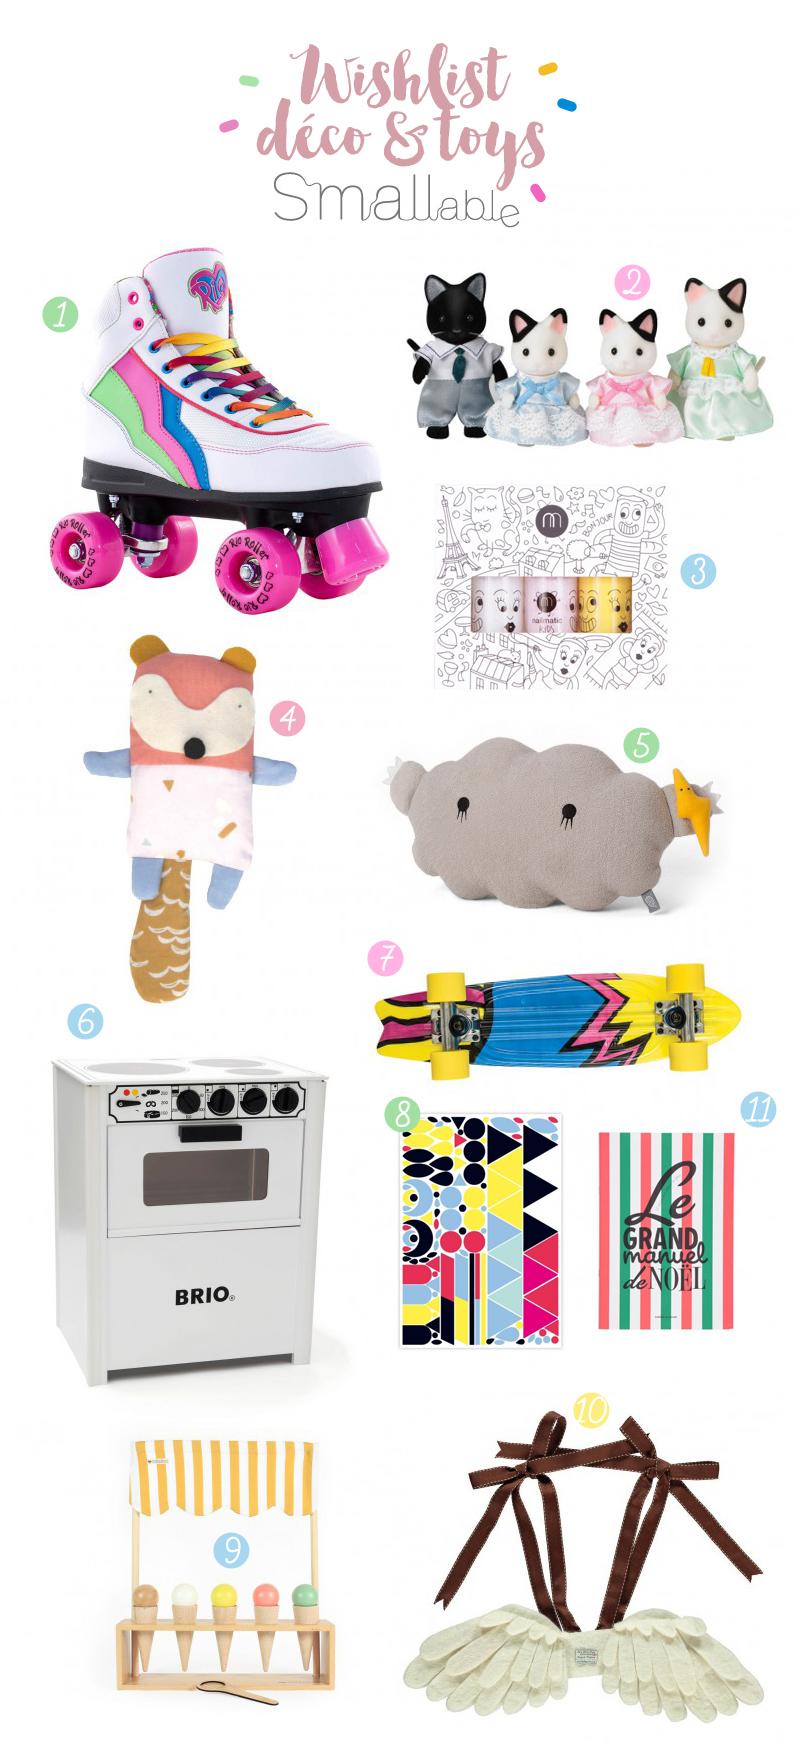 wishlist-deco et toys noel chez smallable